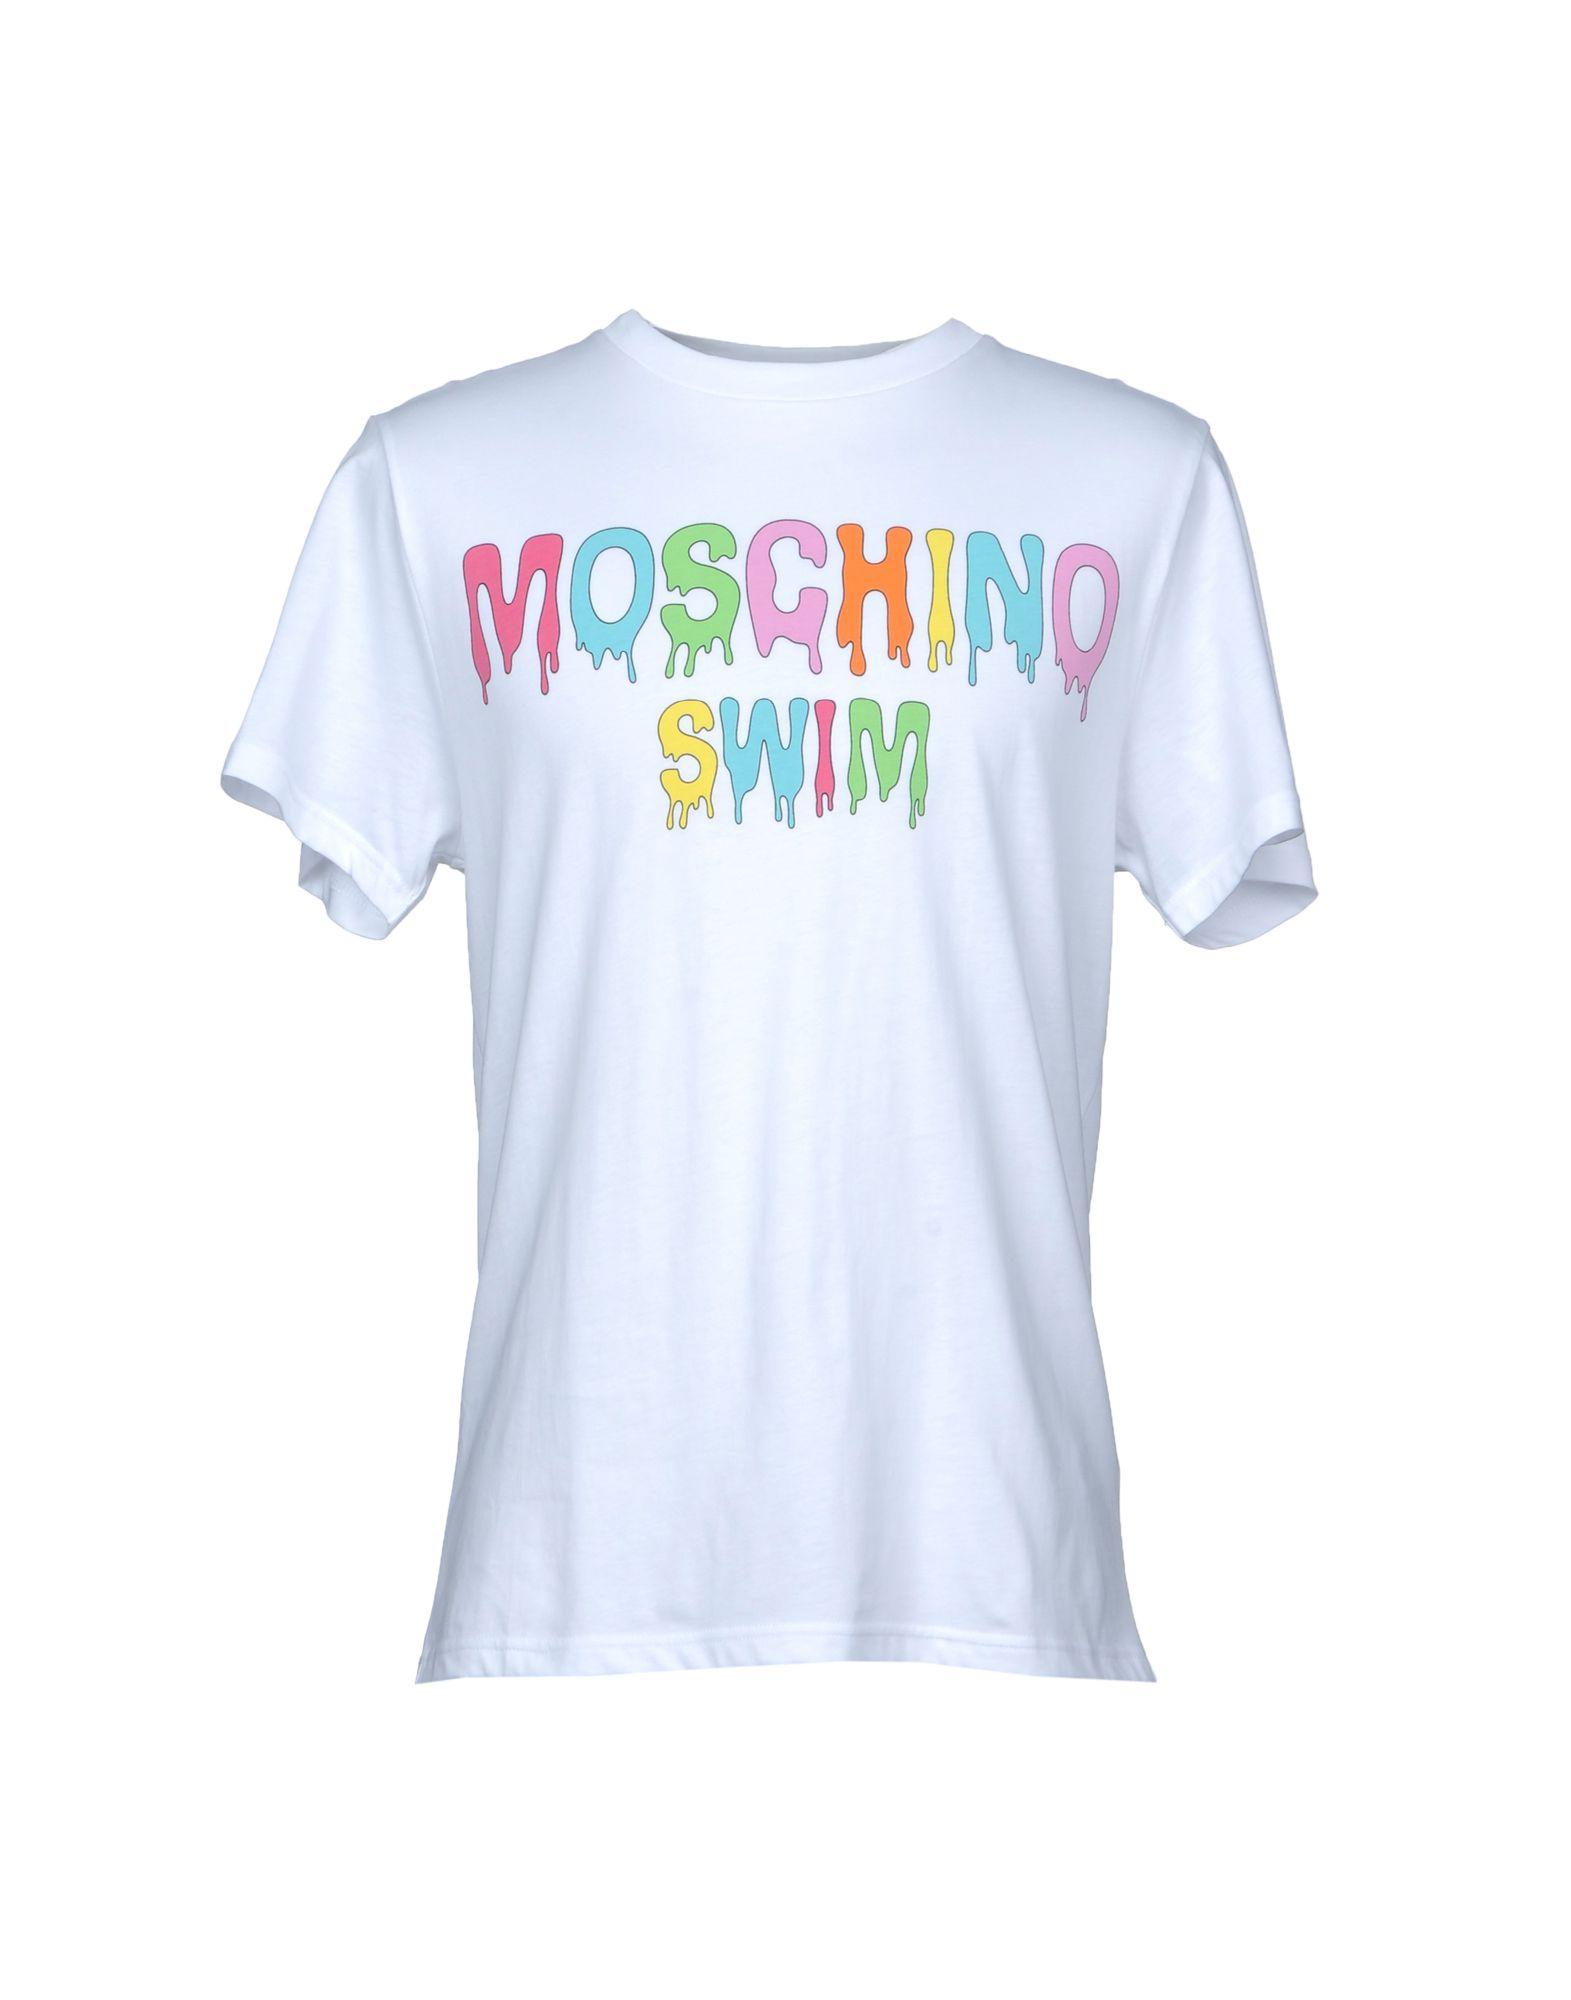 MOSCHINO SWIM Футболка футболка домашняя moschino moschino mo351ewqhh03